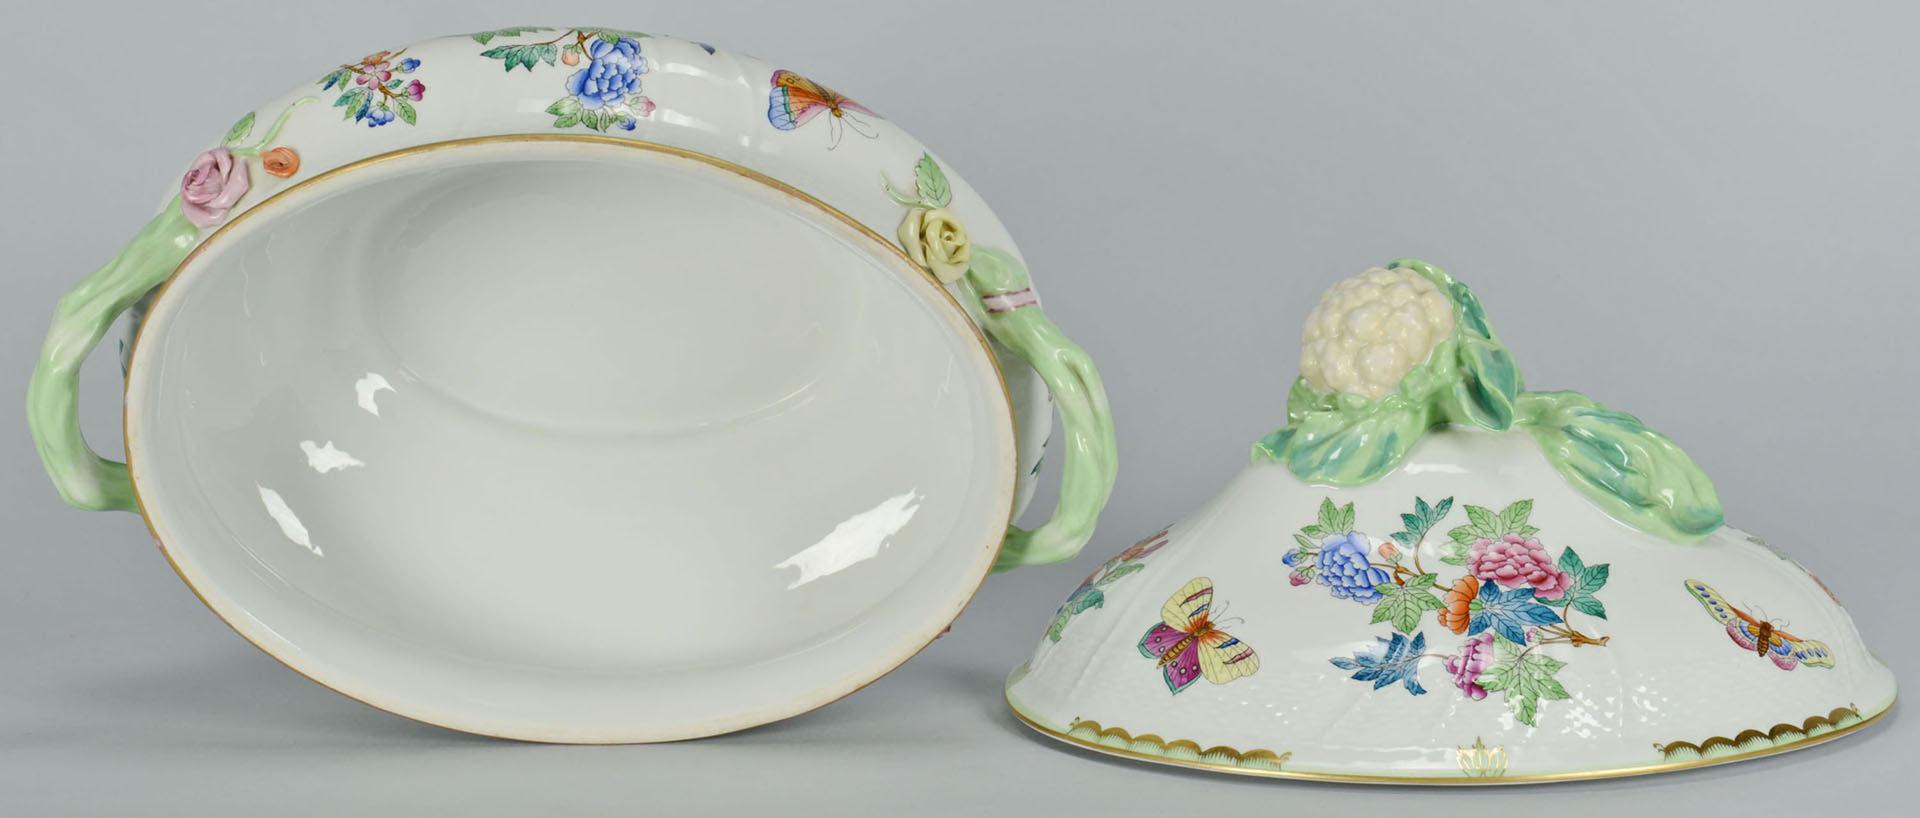 Lot 107: Herend Queen Victoria Lg. Tureen and 2 Platters